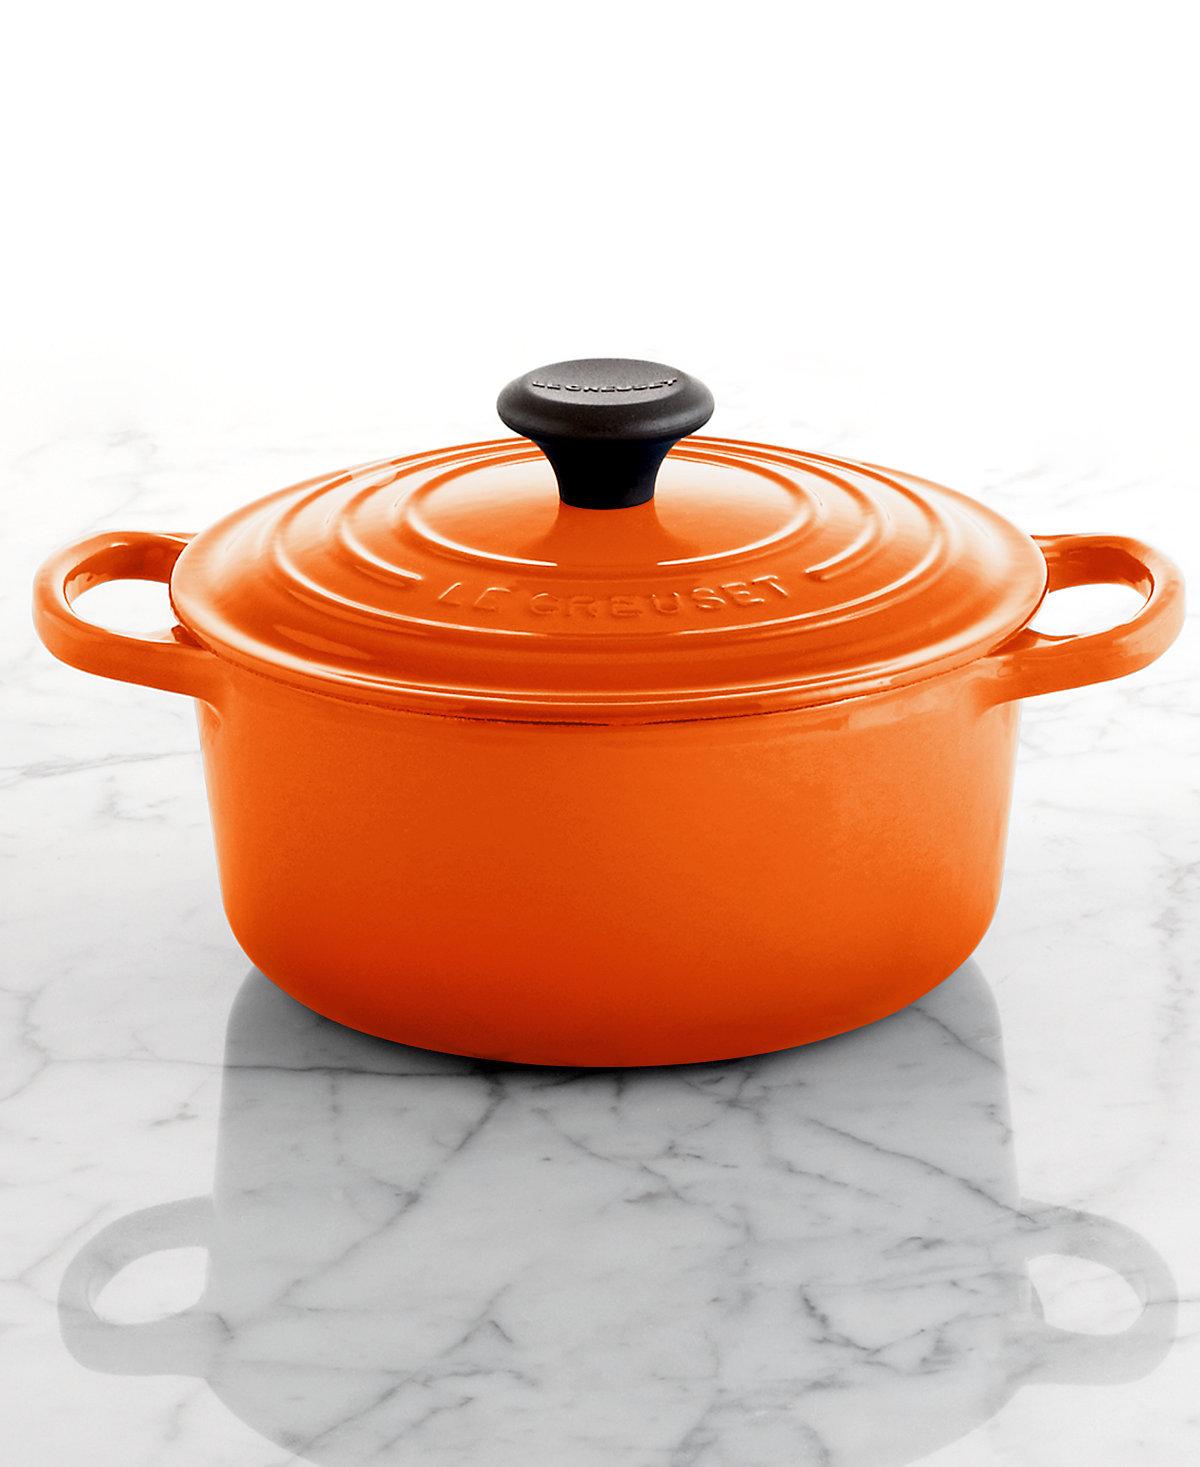 Le Creuset Orange Dutch Oven